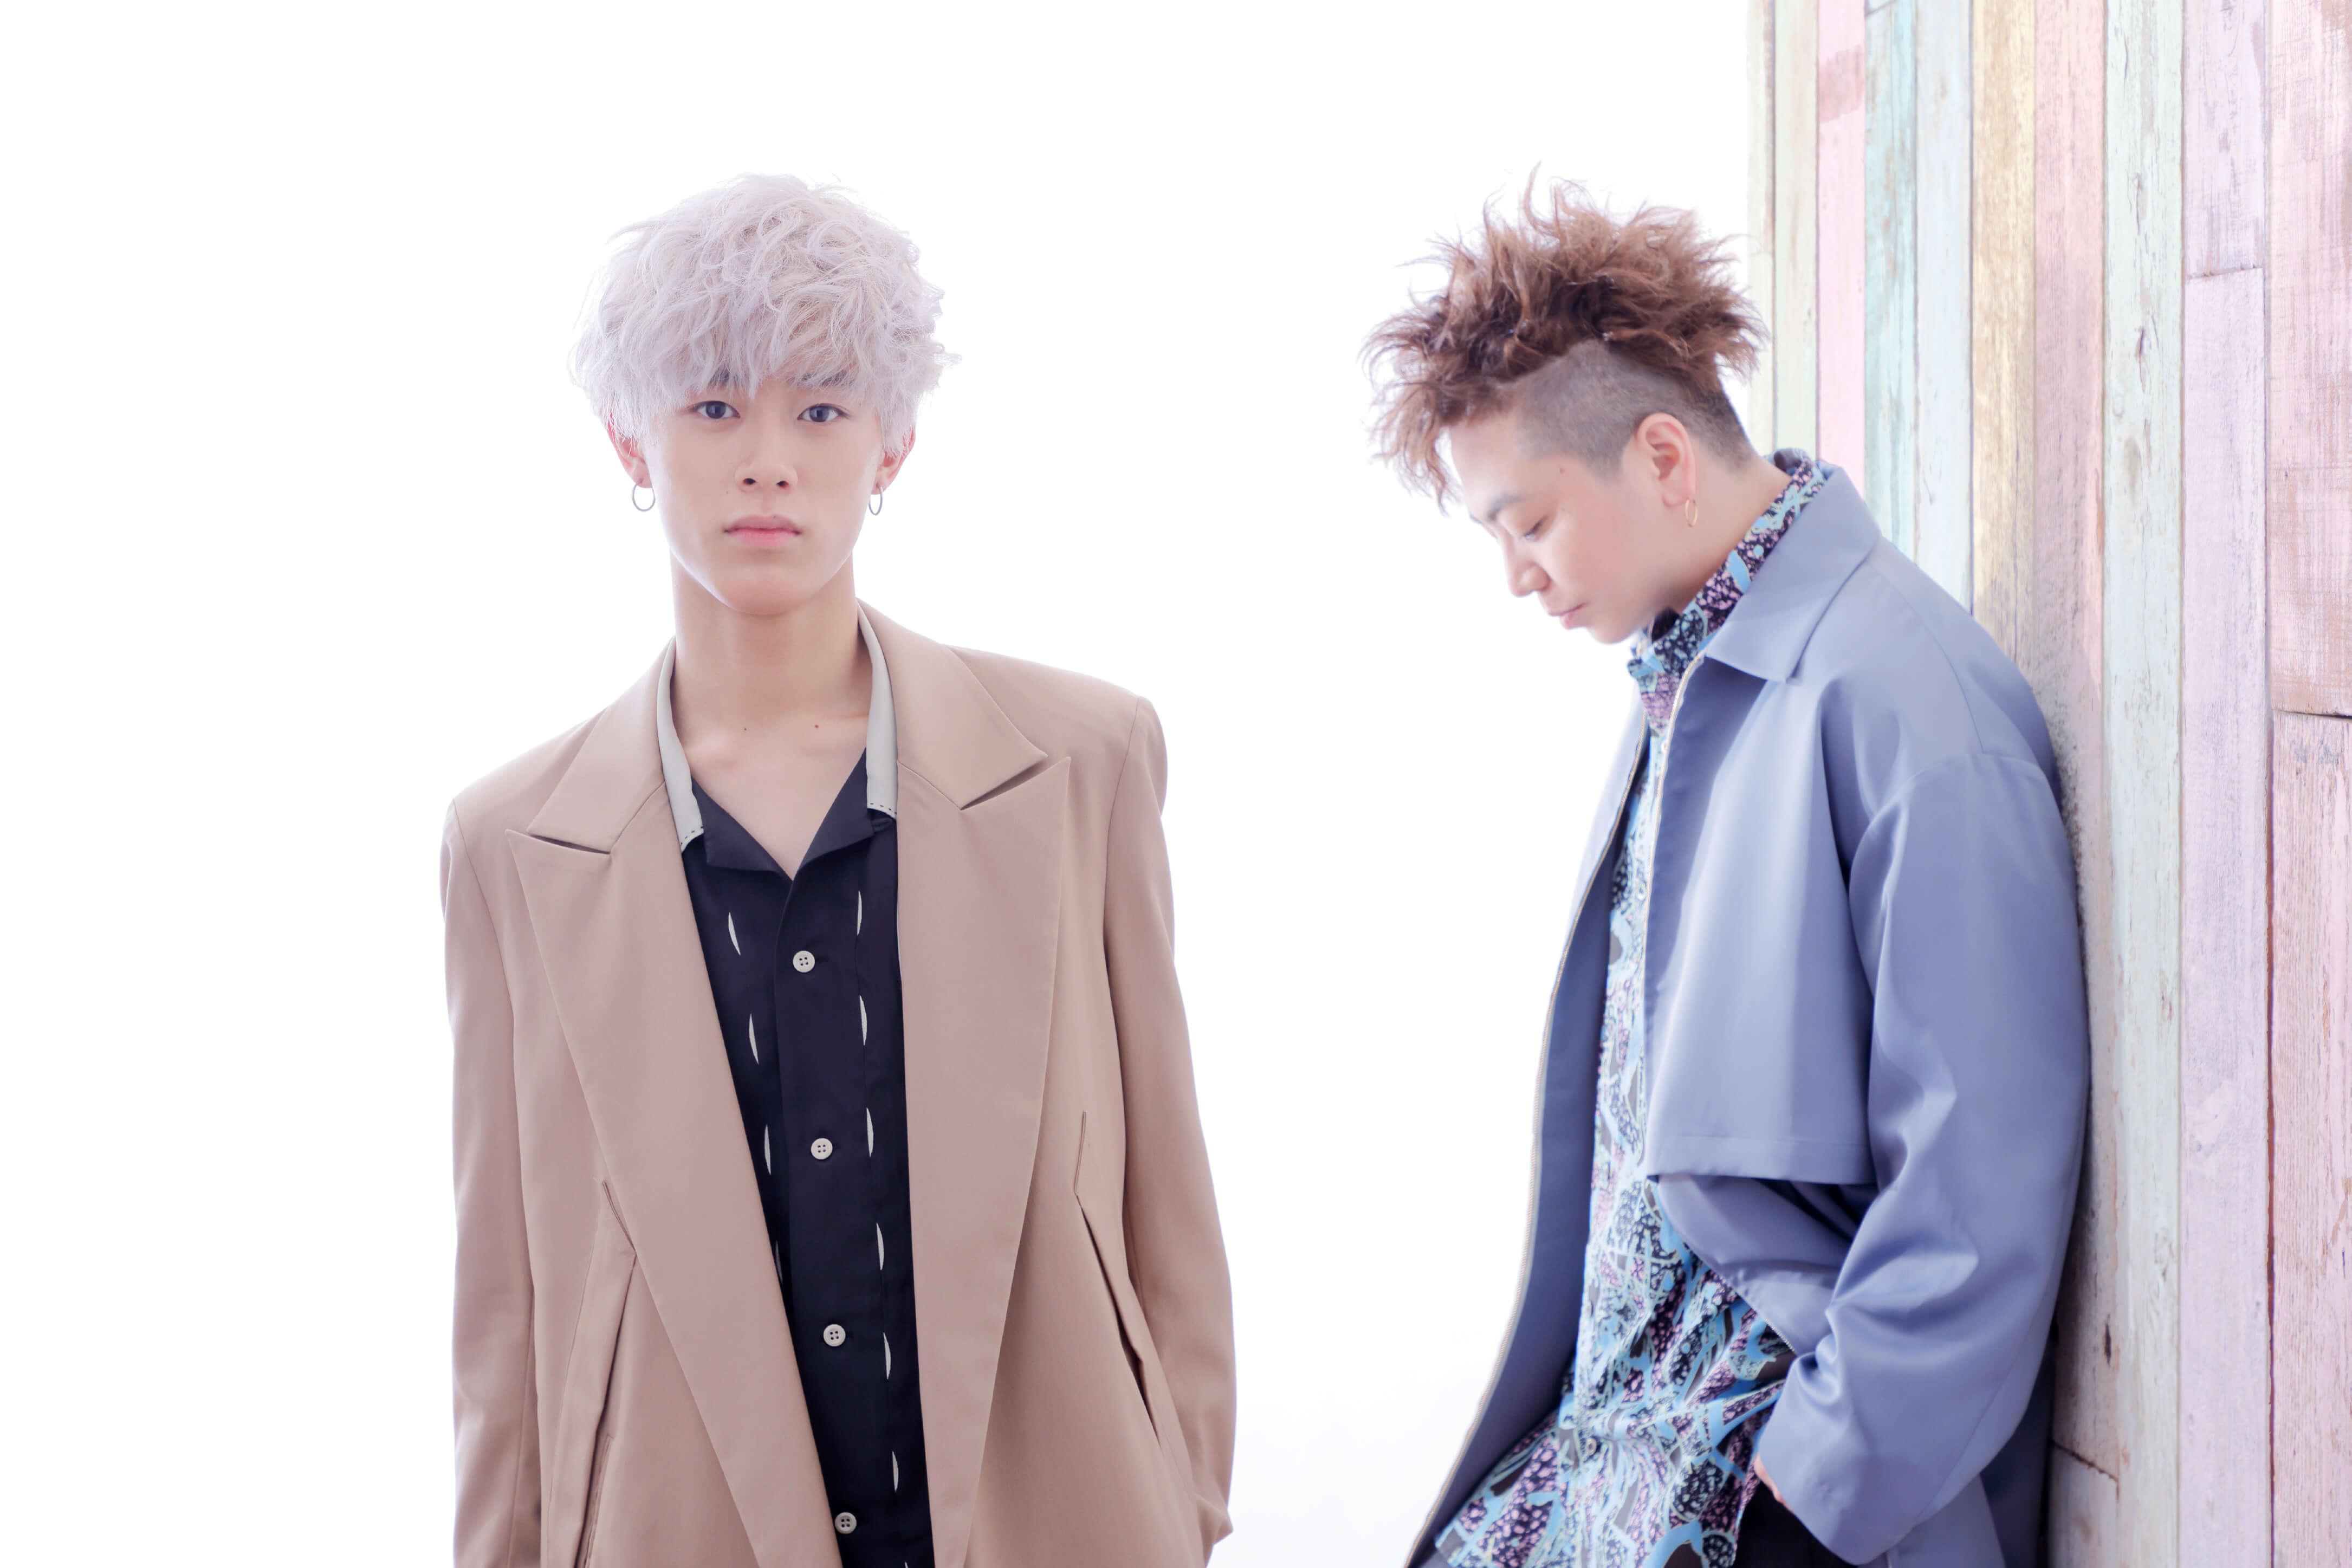 『CultureZ』内コーナー「8DAYS」 9/27(月)~ボーカルデュオ「all at once」が出演決定!